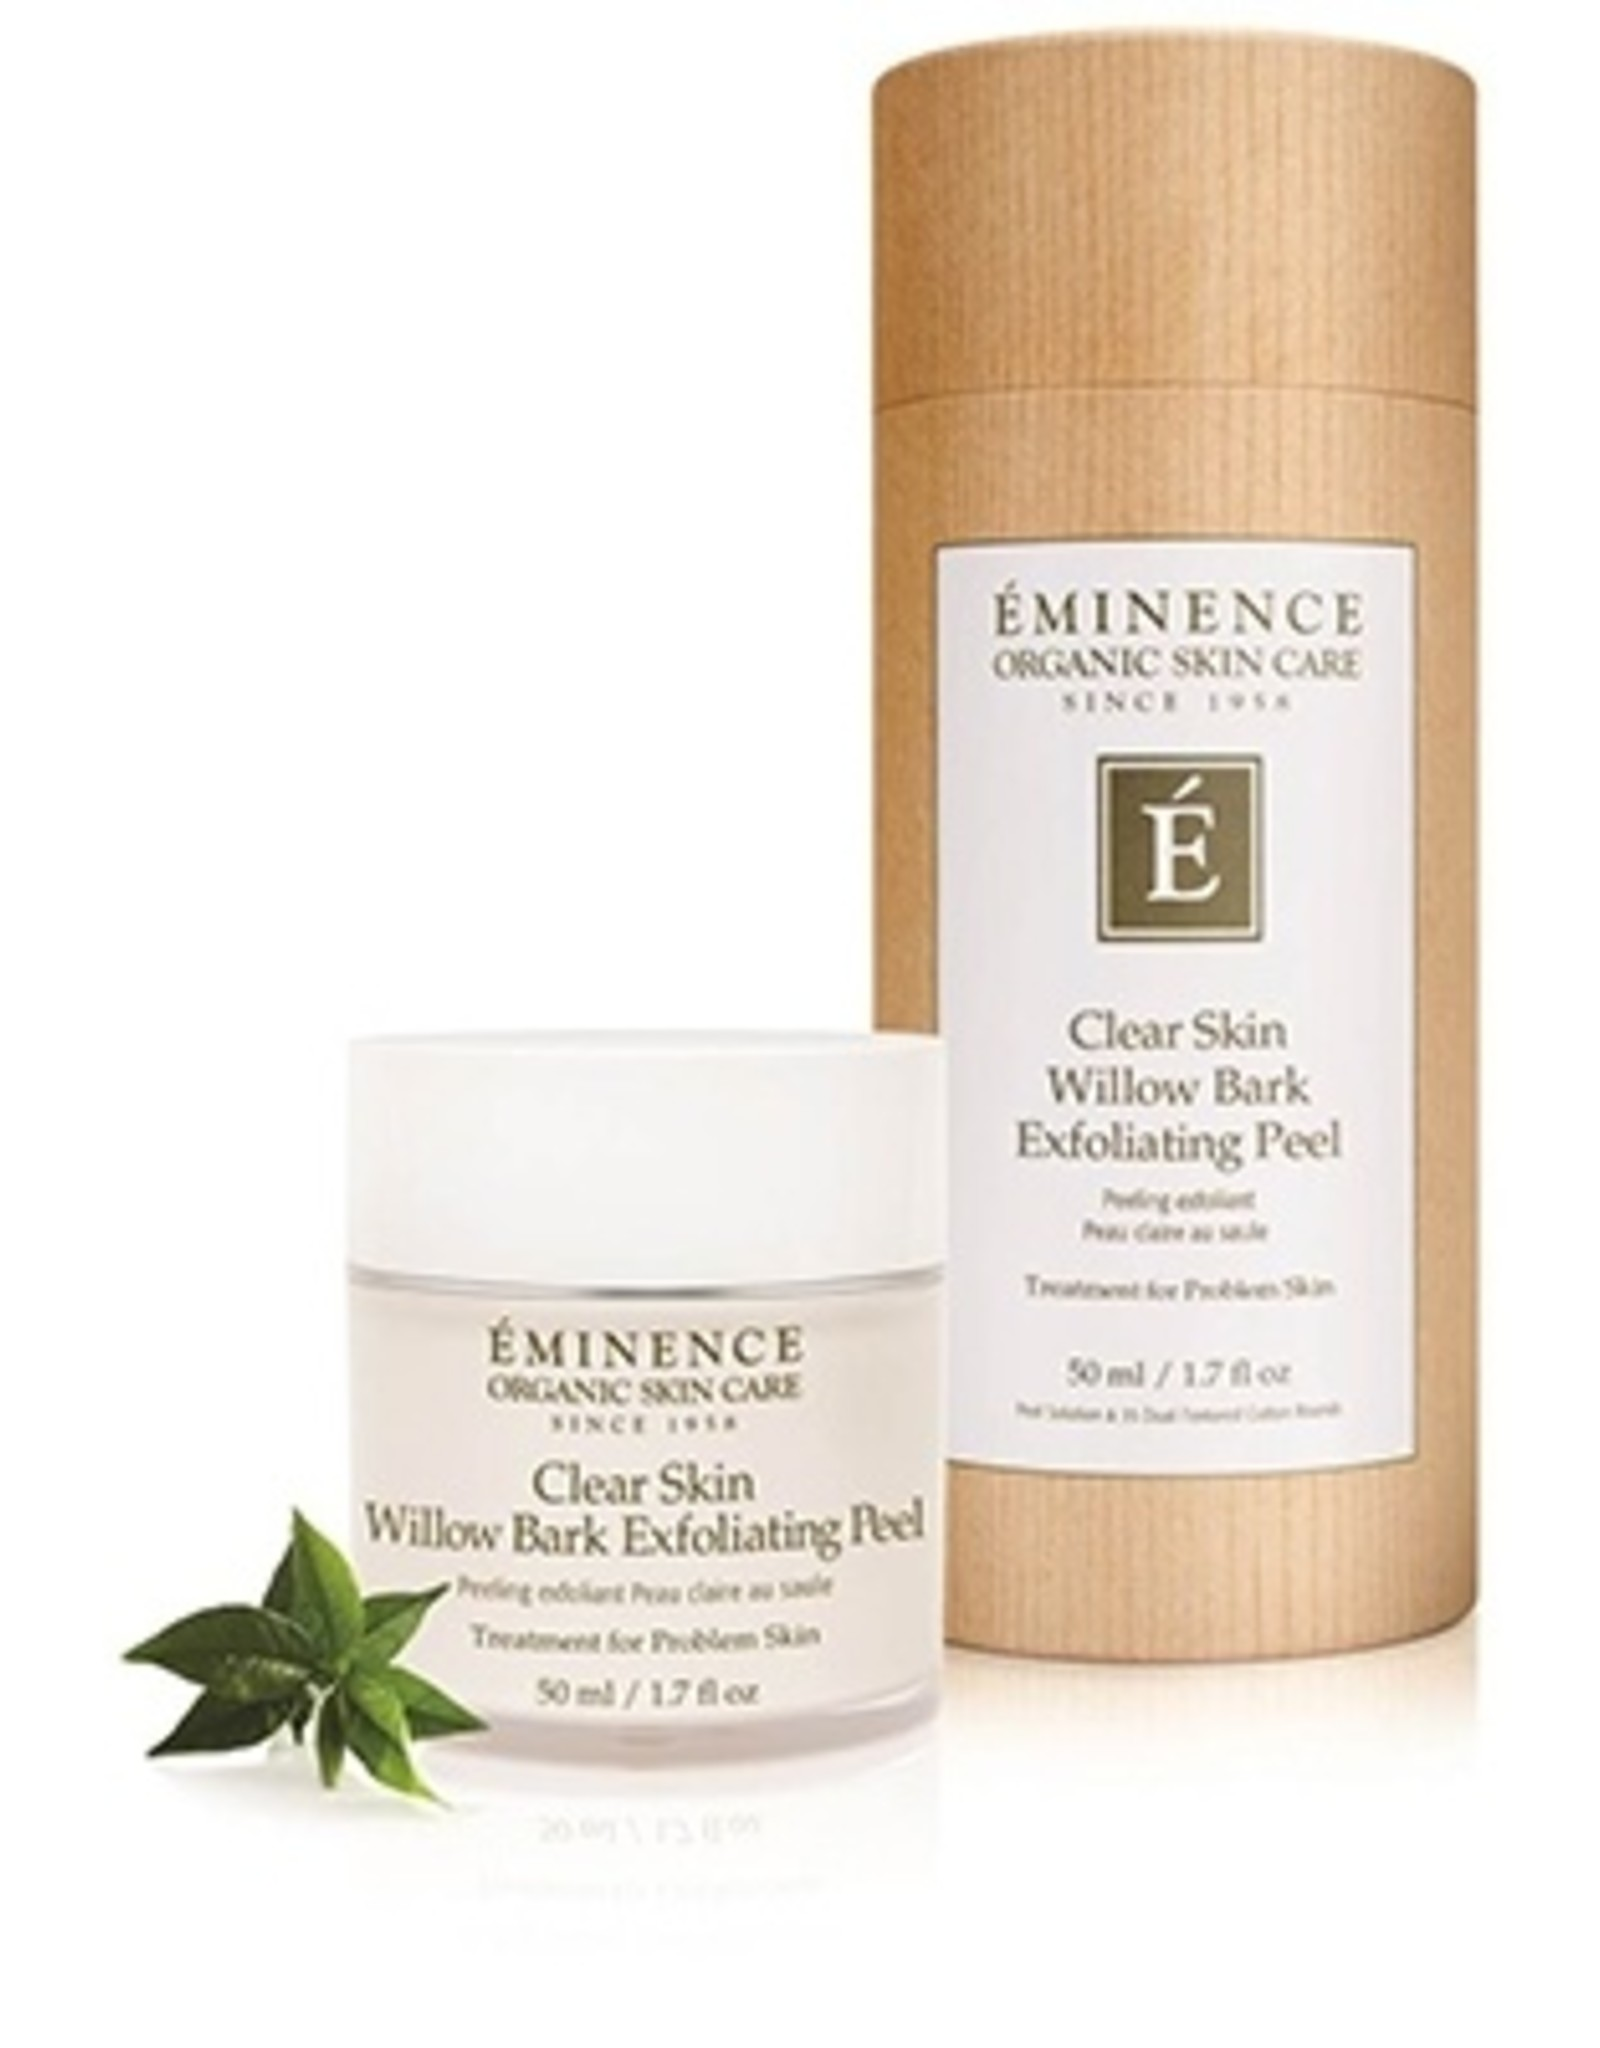 Eminence Organic Skin Care Clear Skin Willow Bark Exfoliating Peel